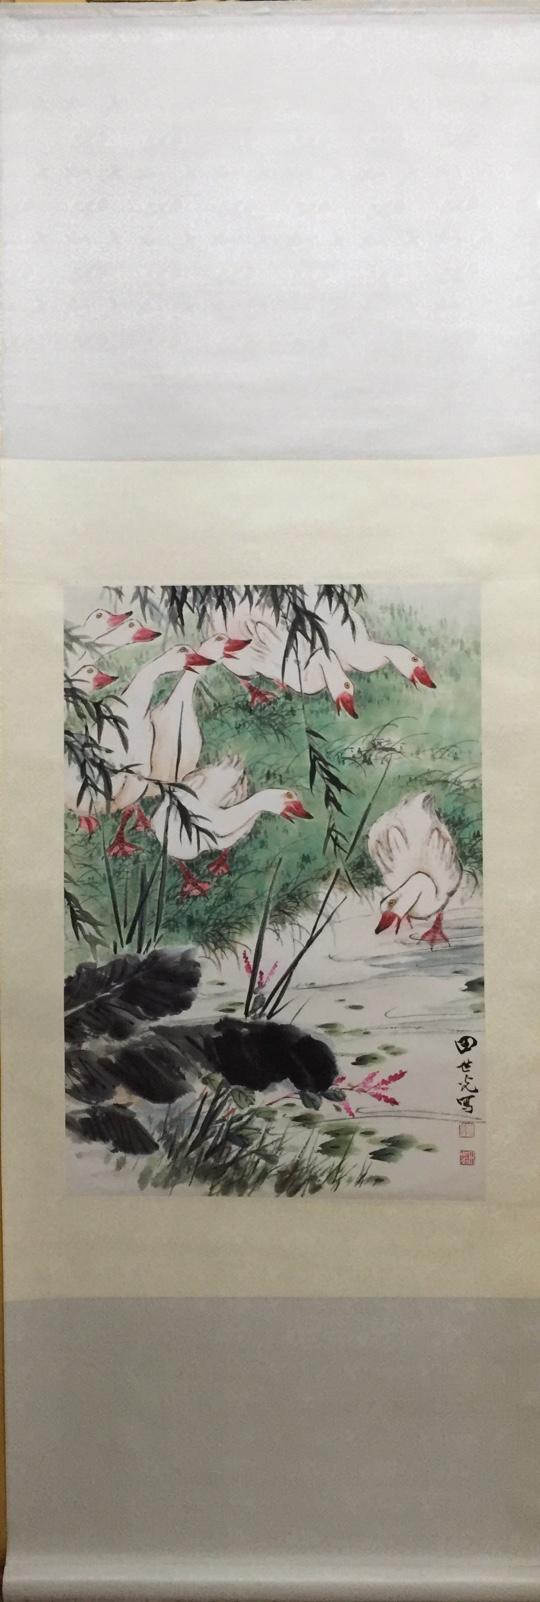 Tian Shiguang(), A Flock of Geese